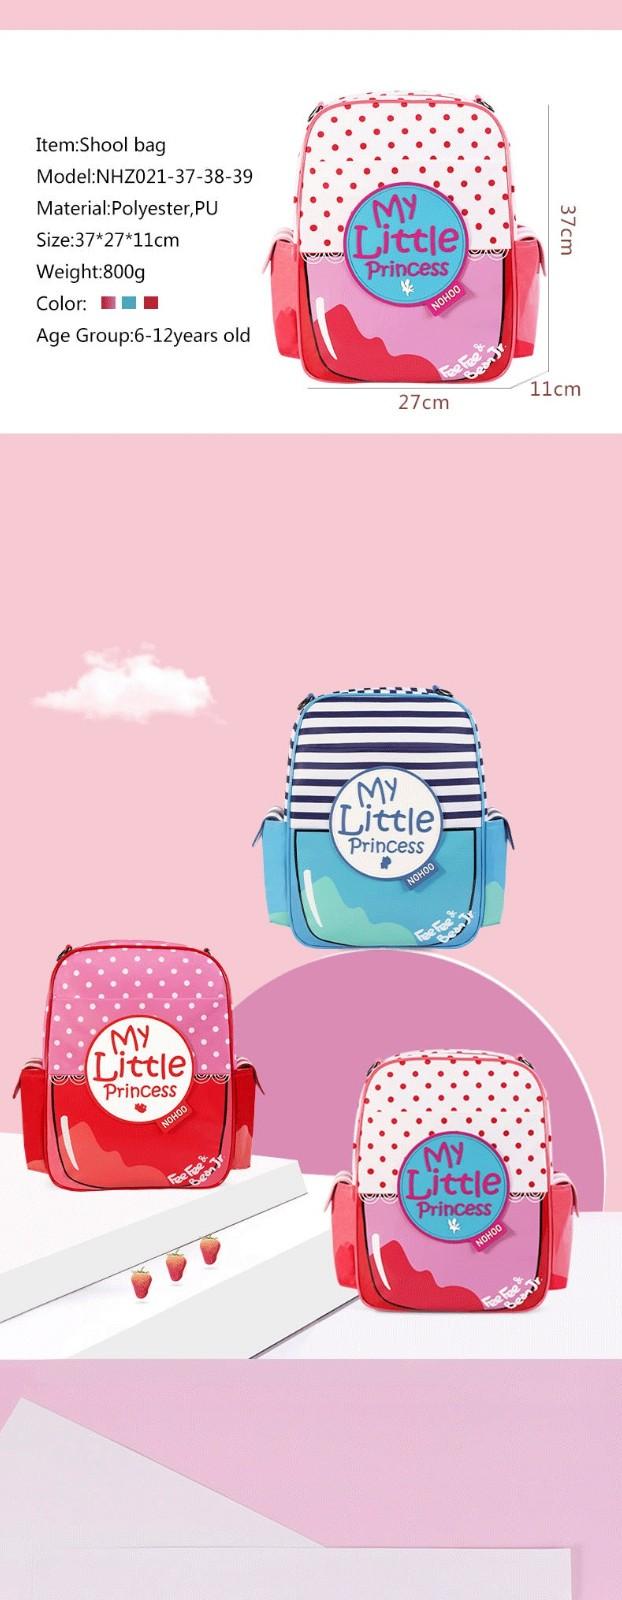 product-NOHOO-Nohoo 2019 new arrival waterproof lightweight PU 3D cartoon children school bag for gi